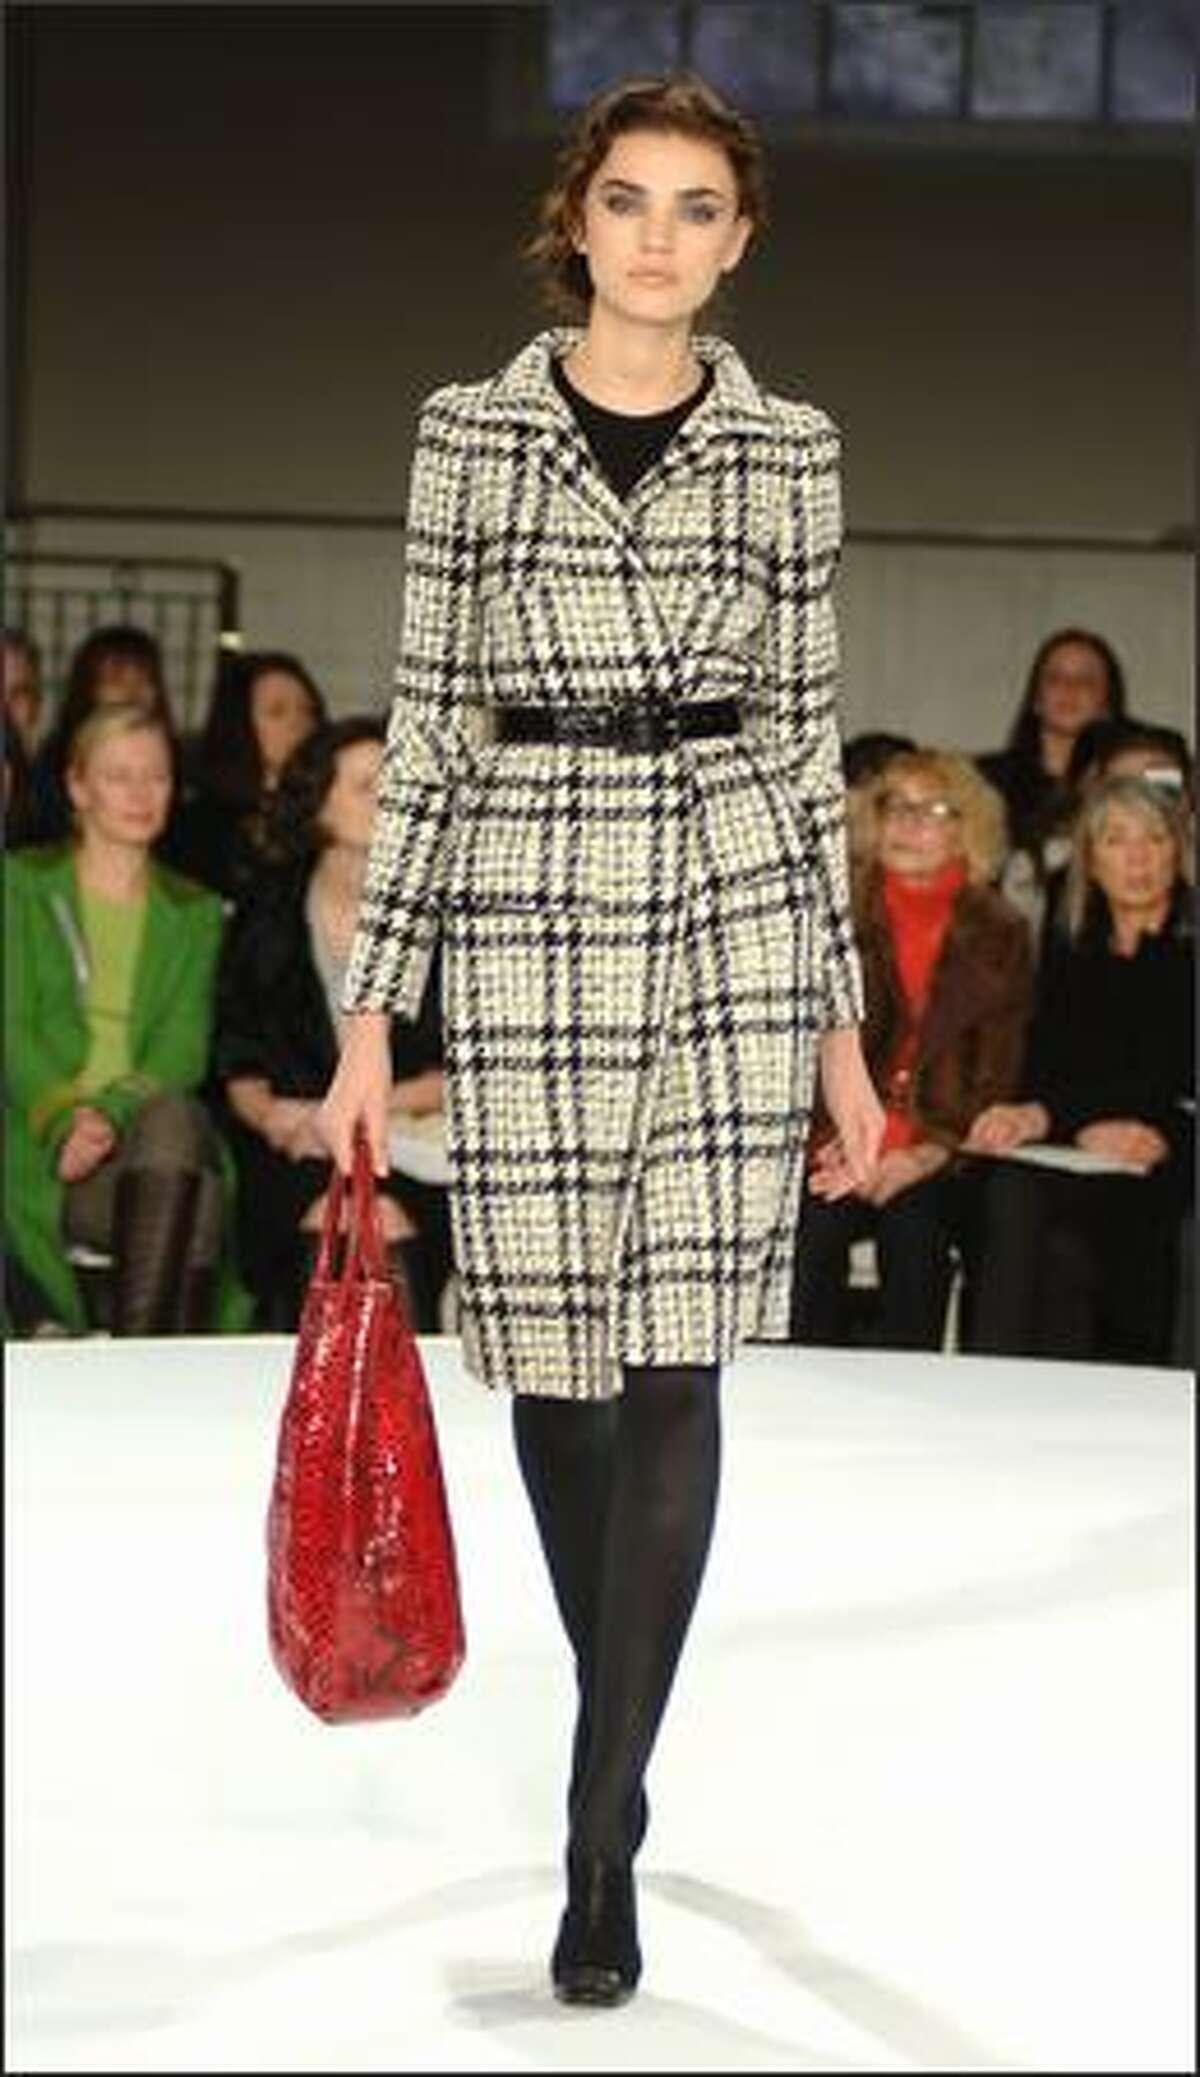 A model walks the runway at the Oscar de la Renta Pre-Fall 2008 Fashion Show on Monday in New York City.